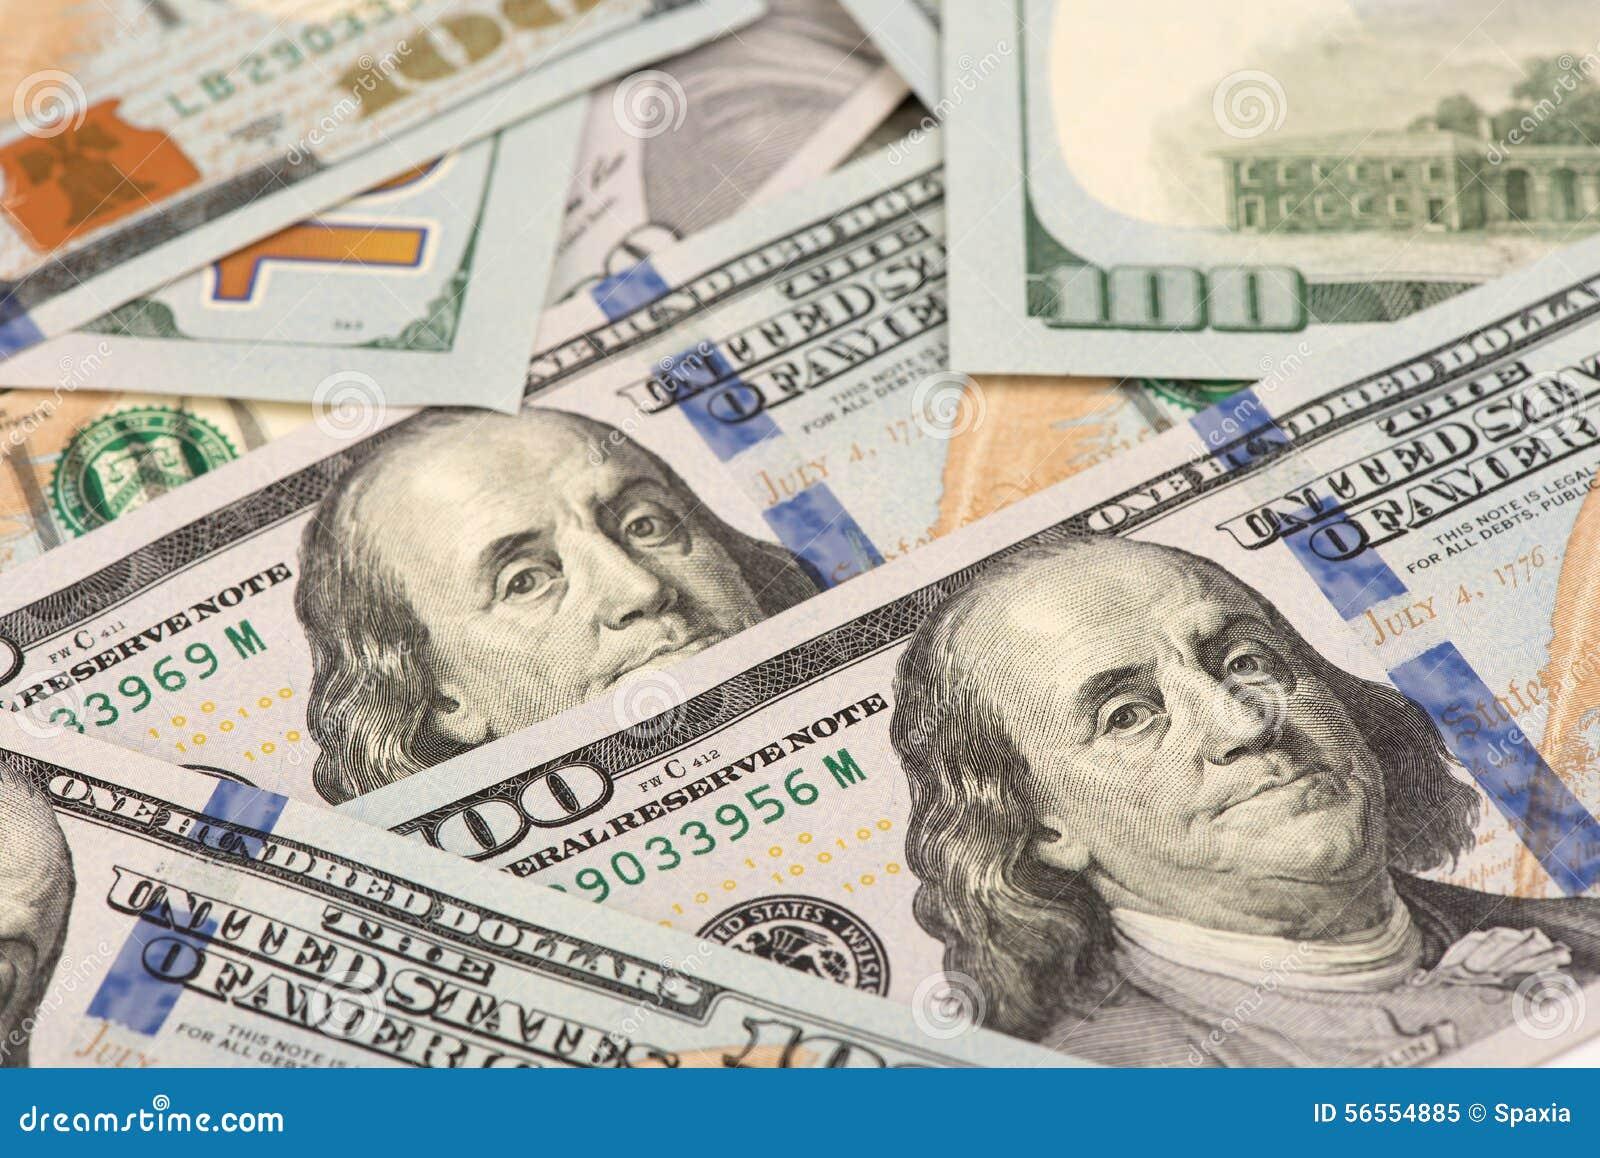 Download δολάριο εκατό λογαρια&sigm στοκ εικόνα. εικόνα από αποταμίευση - 56554885